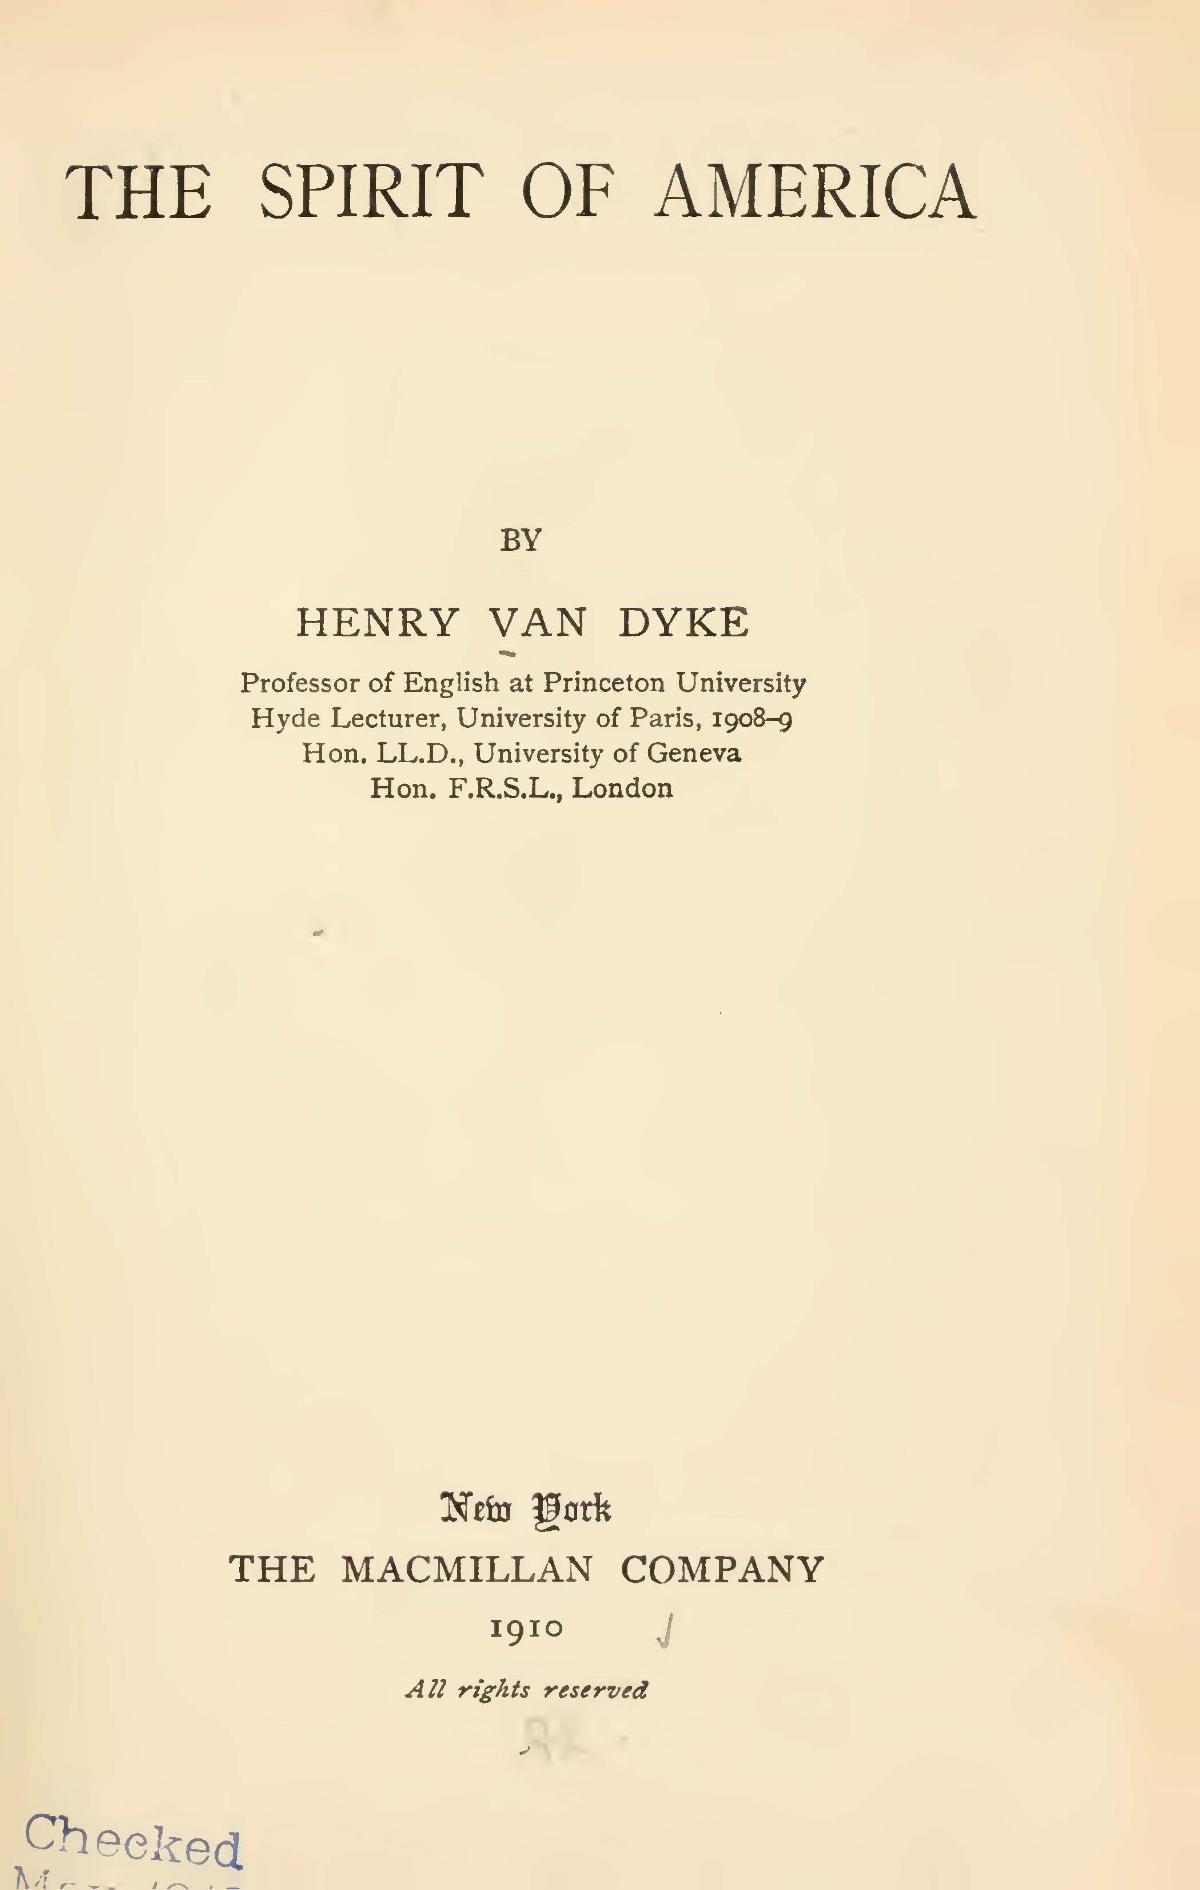 Van Dyke, Jr., Henry Jackson, The Spirit of America Title Page.jpg